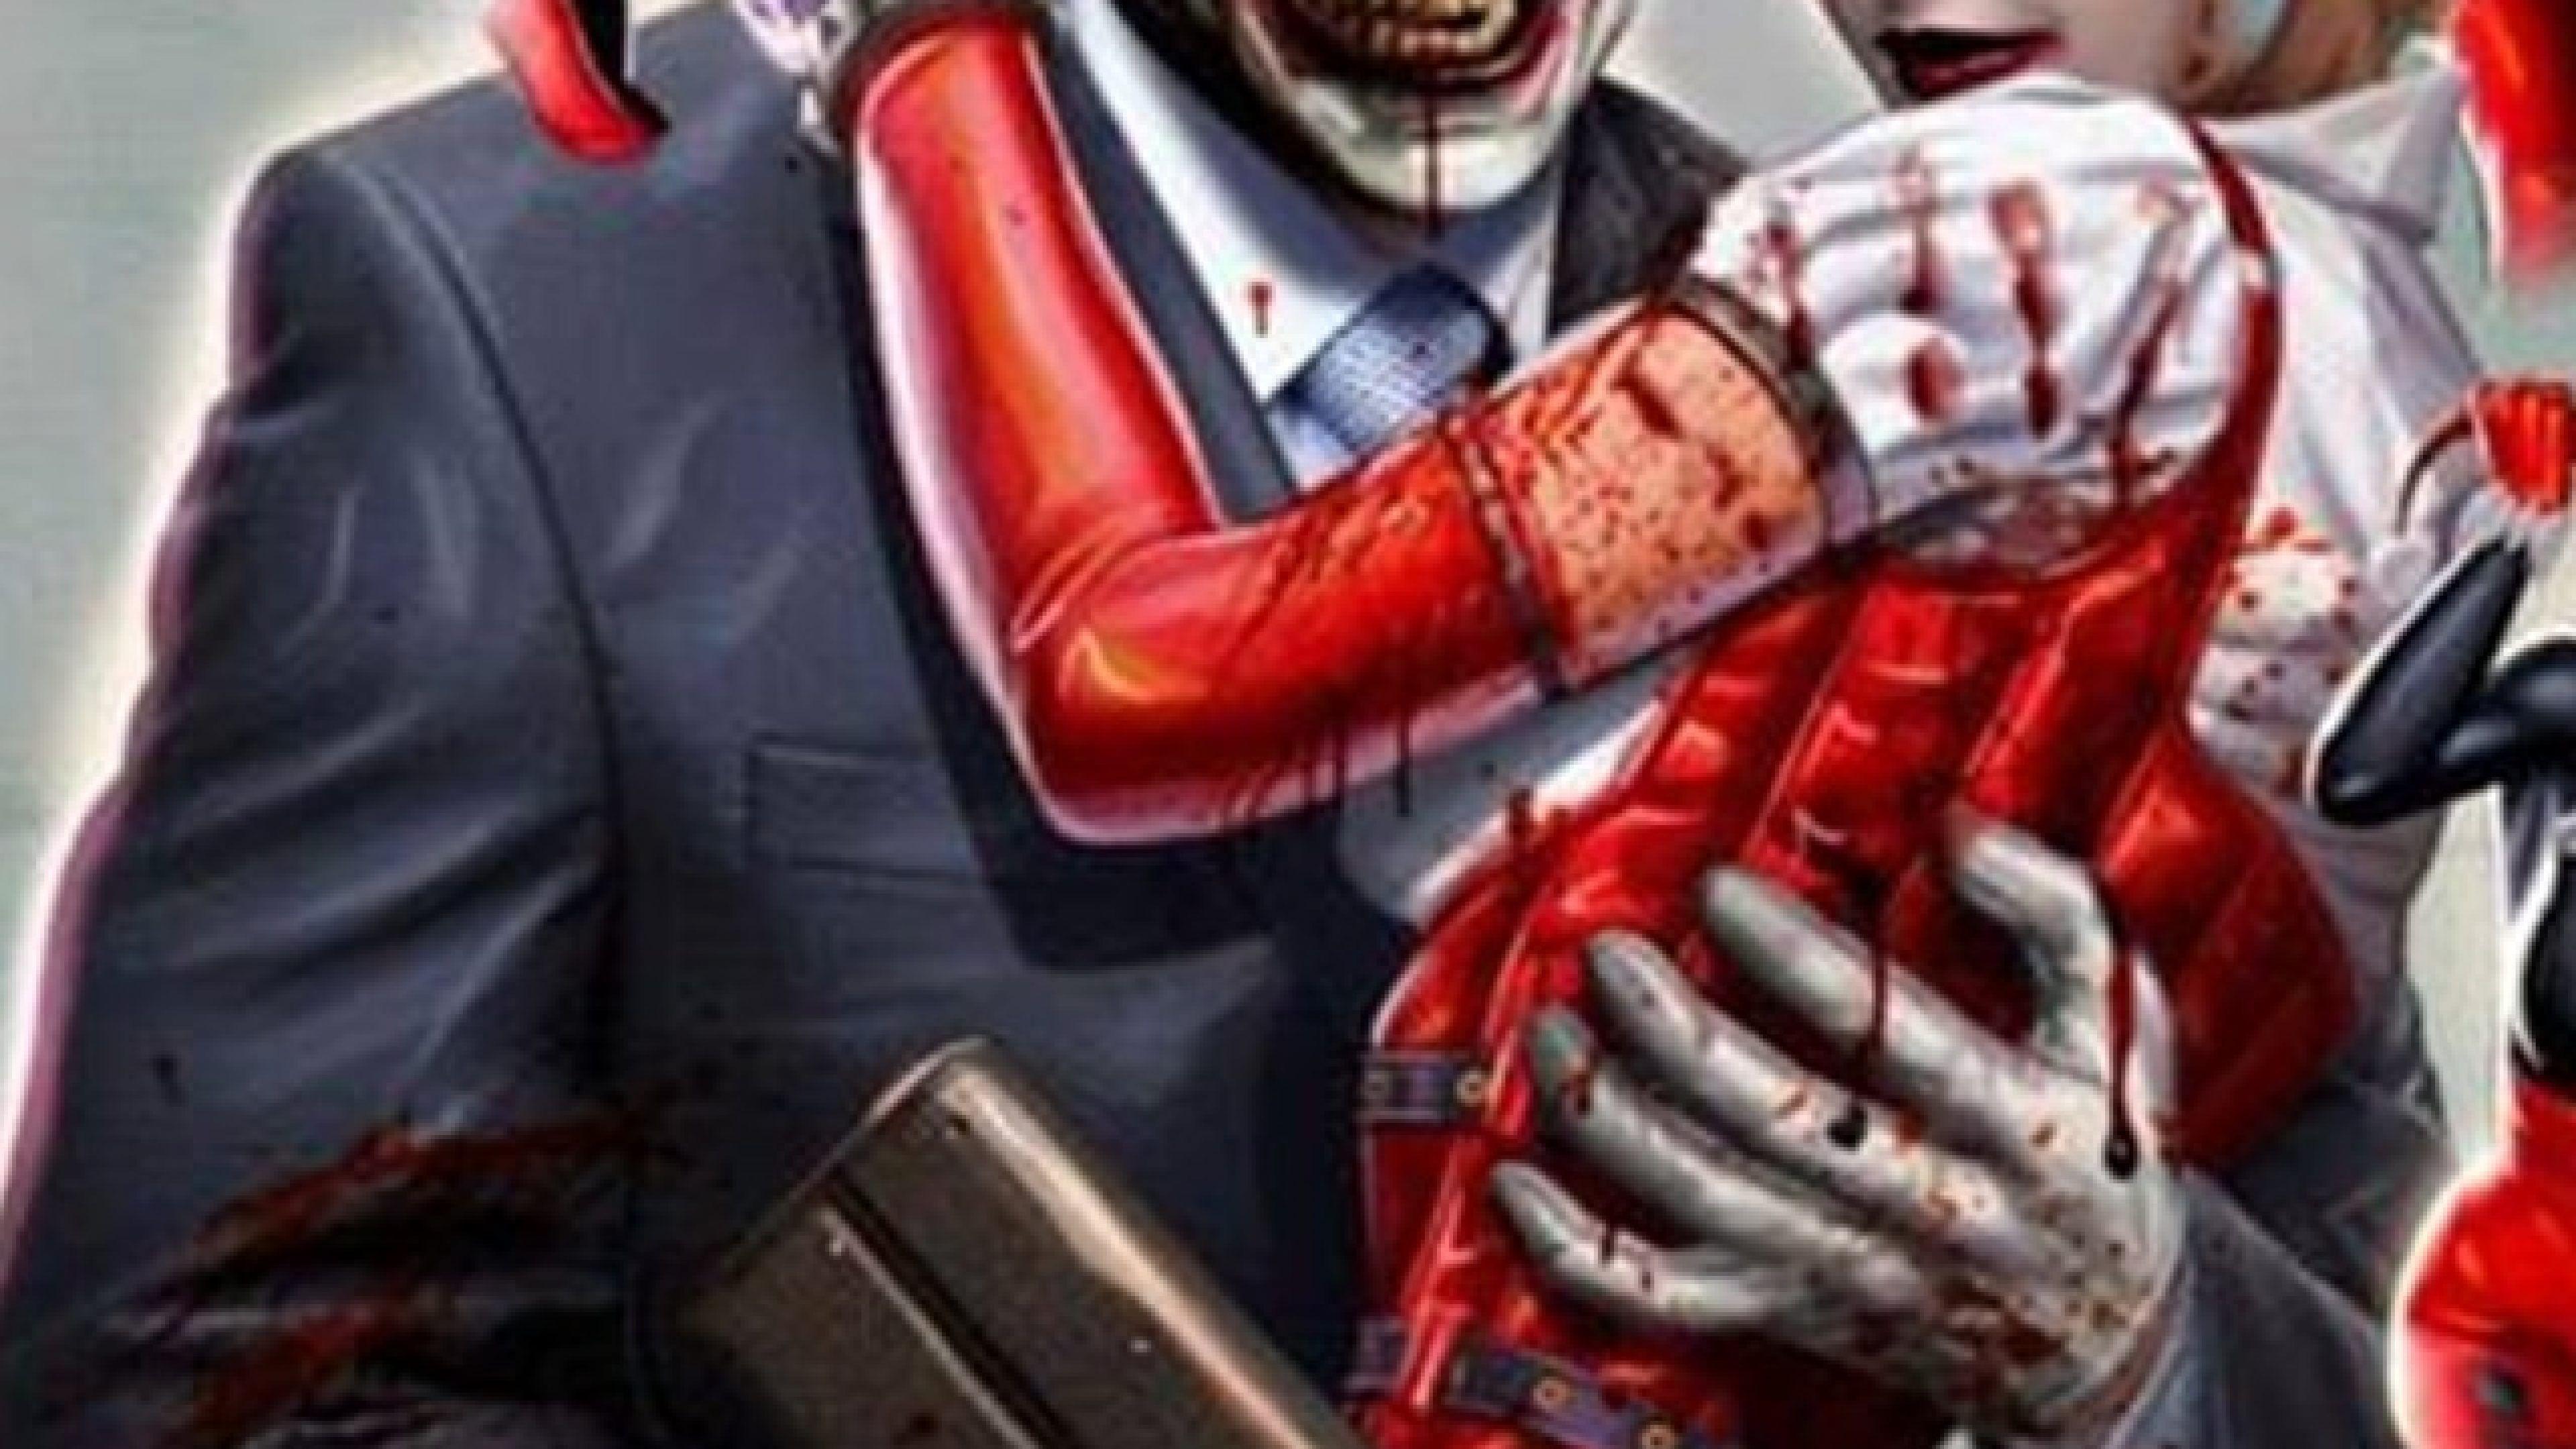 … Harley Quinn And Joker Iphone Wallpaper. Download